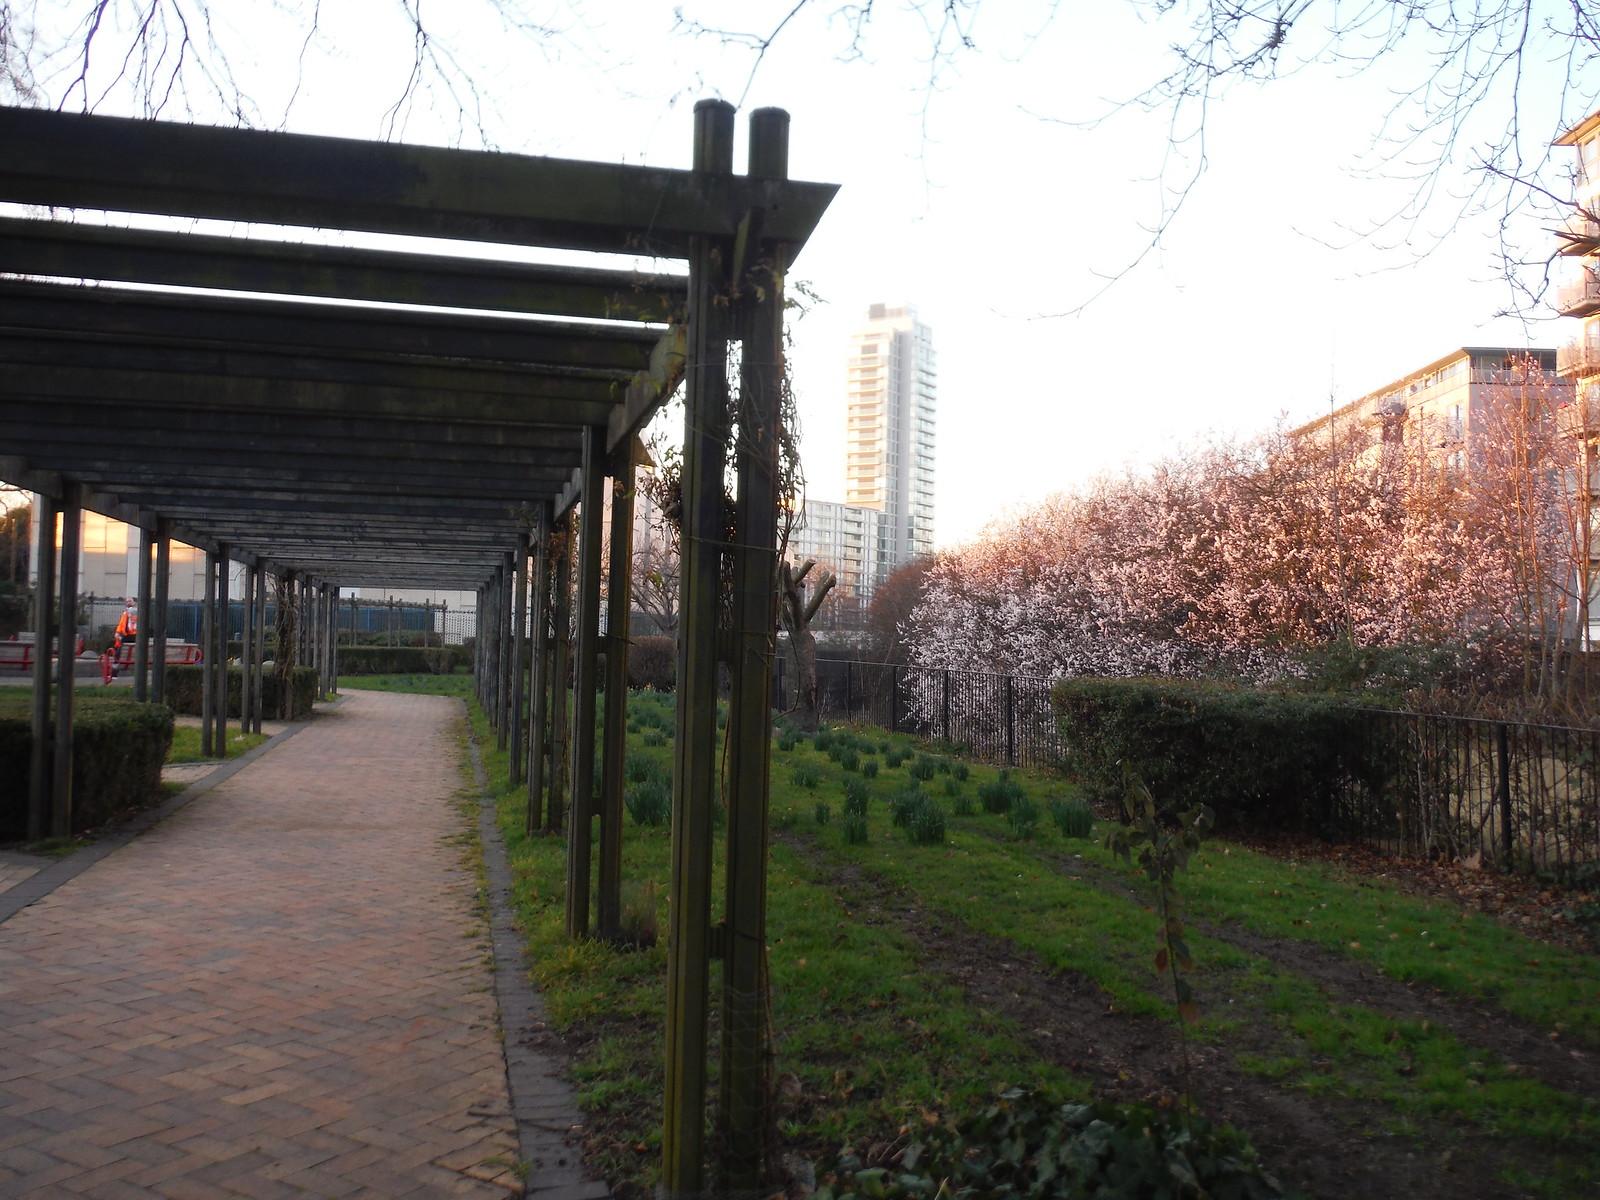 Pergola, Brookmill Park SWC Short Walk 36 - Waterlink Way (Lower Sydenham to Greenwich)